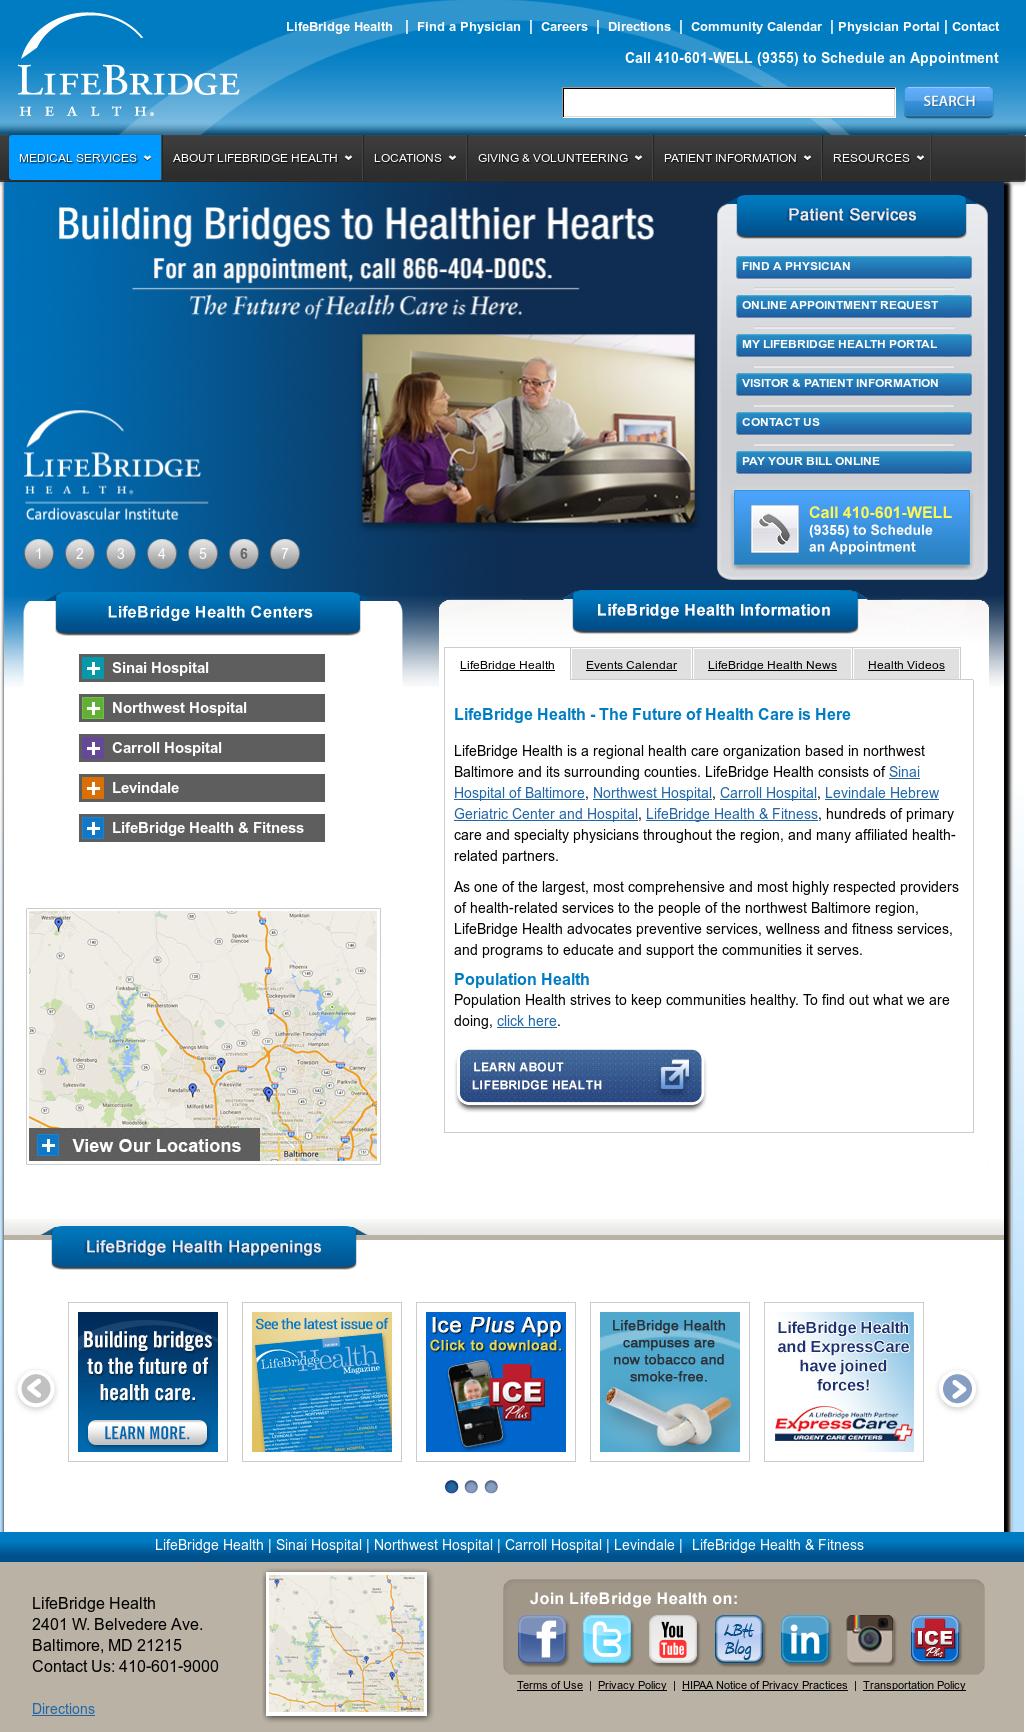 LifeBridge Health Competitors, Revenue and Employees - Owler